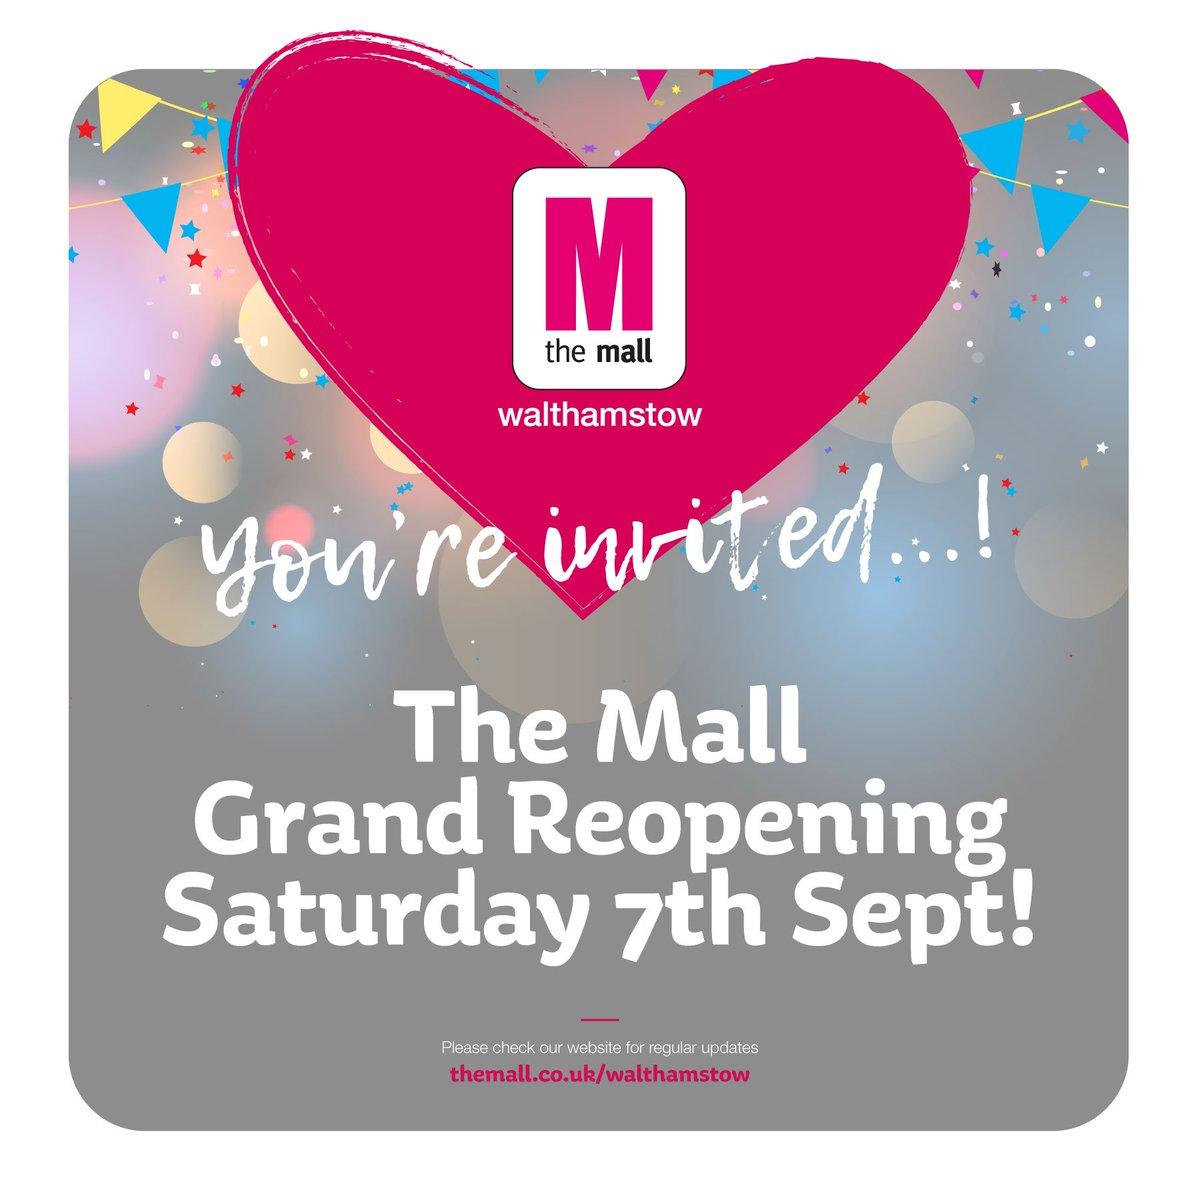 The Mall Walthamstow (@MallWalthamstow) | Twitter